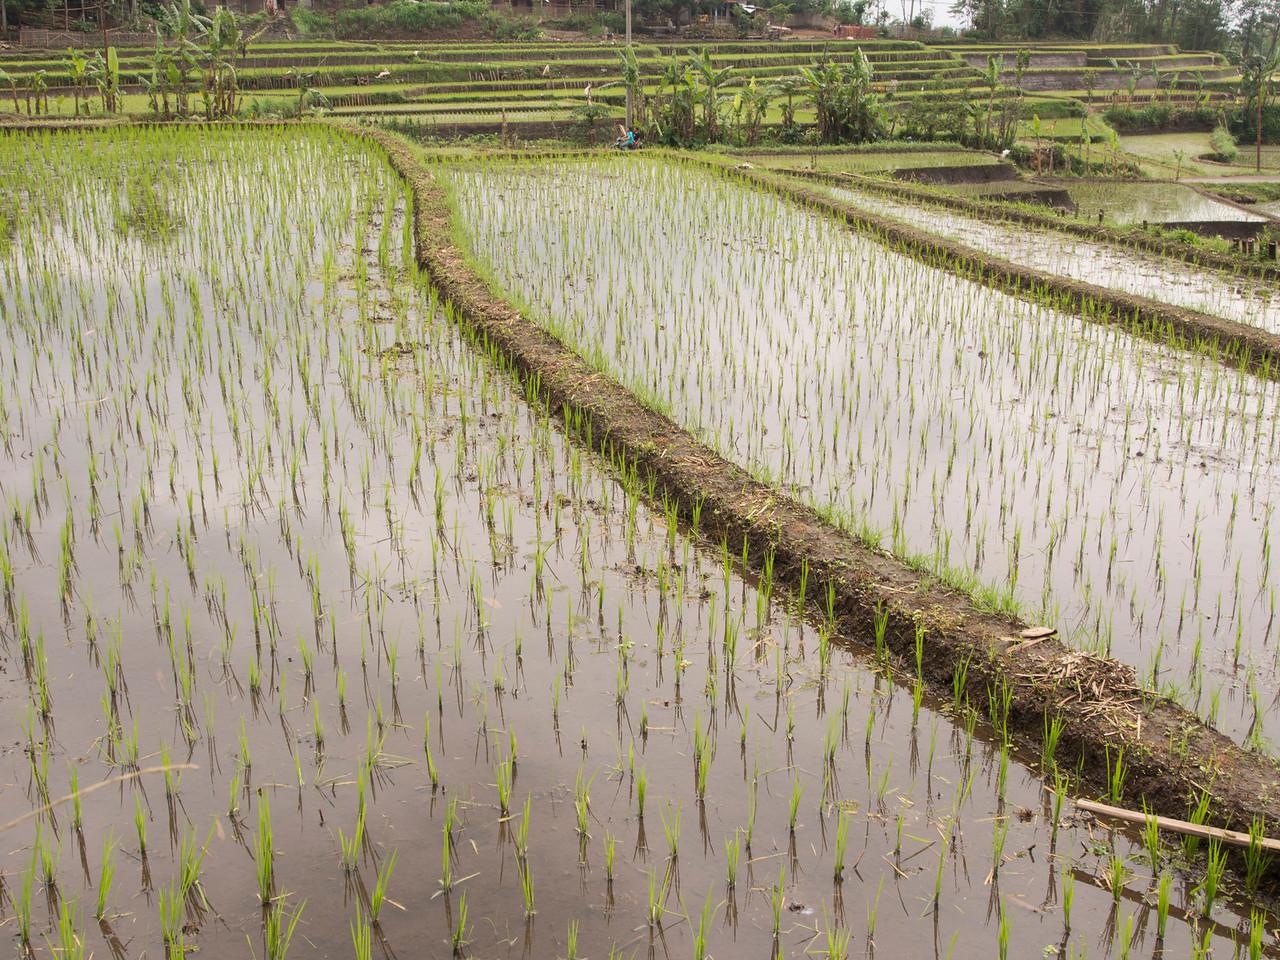 Candi Sumberawan, Java, Indonesia